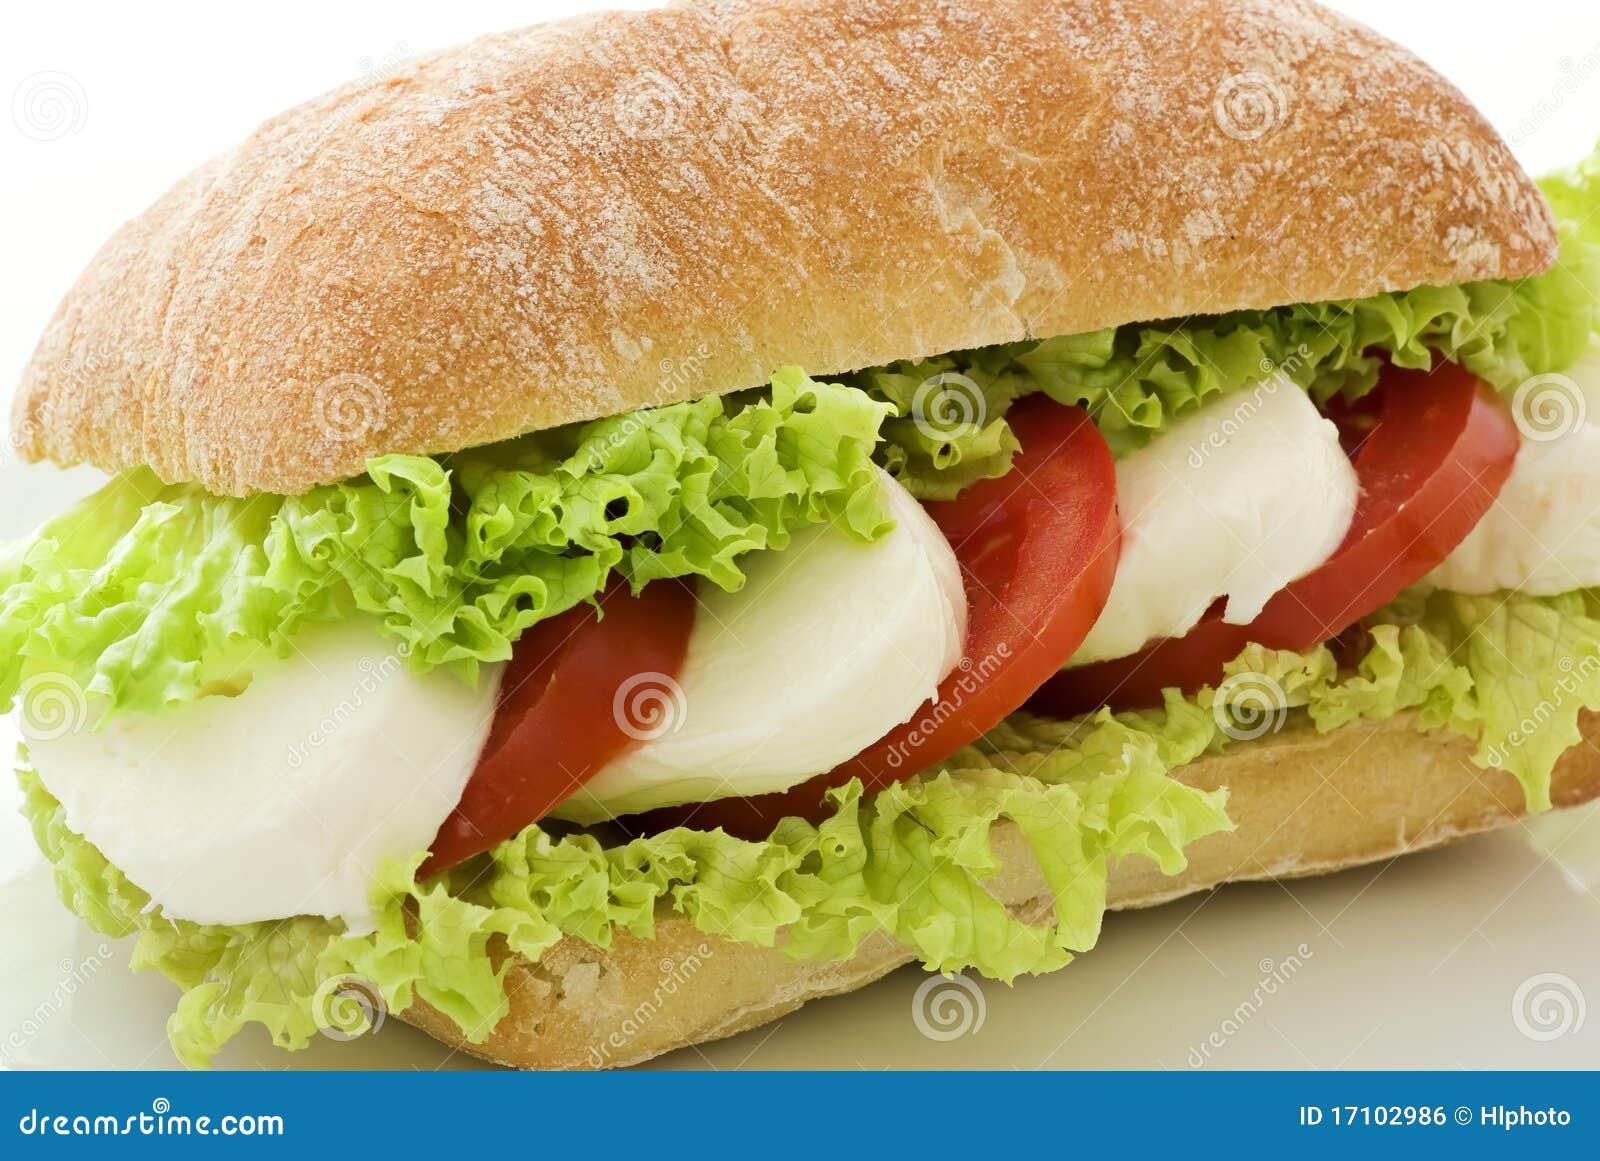 Tomato Mozzarella Sandwich Royalty Free Stock Image - Image: 17102986